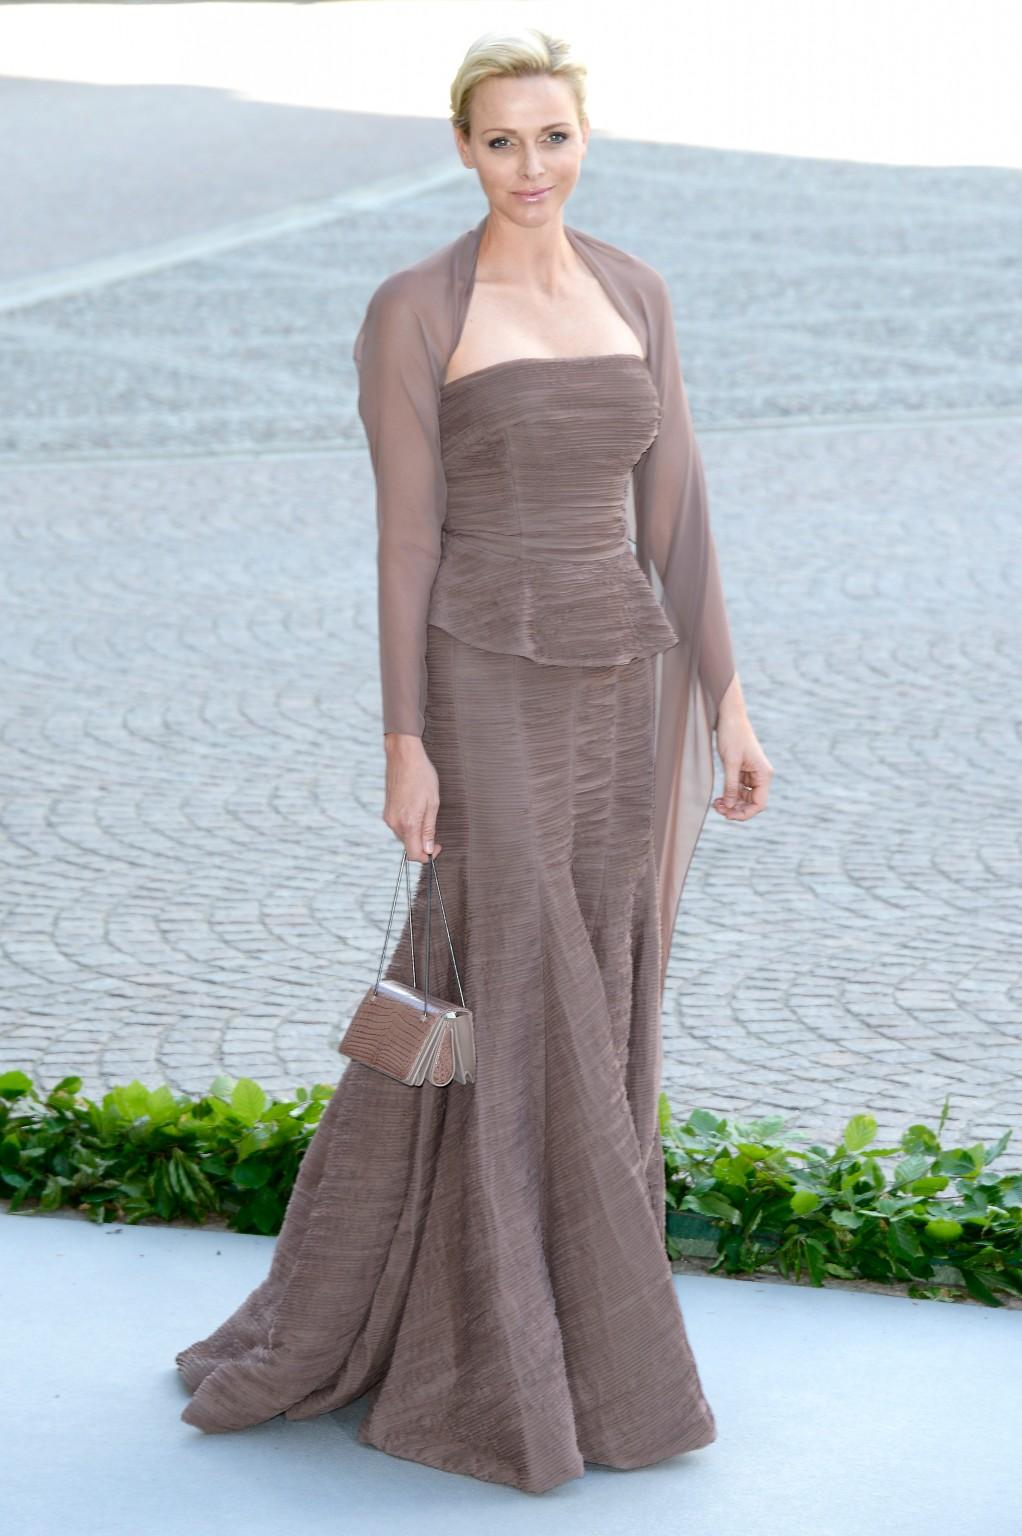 Princess_Charlene_of_Monaco